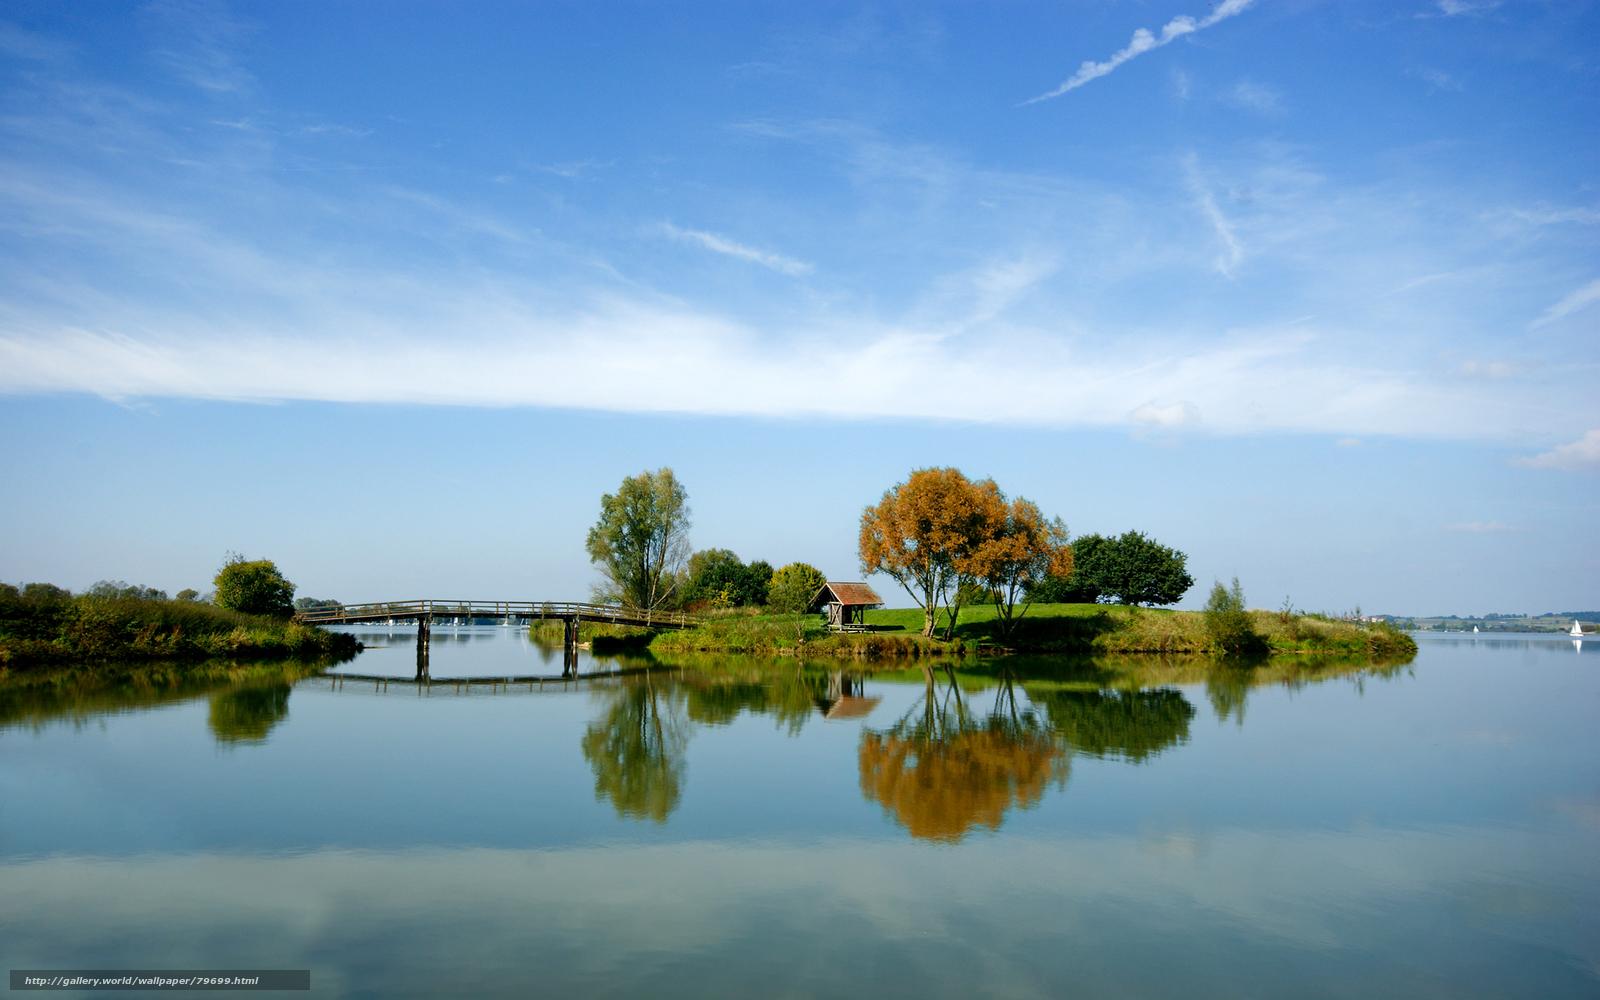 Descargar gratis foto papel pintado paisajes ro fondos - Papel pintado paisajes ...